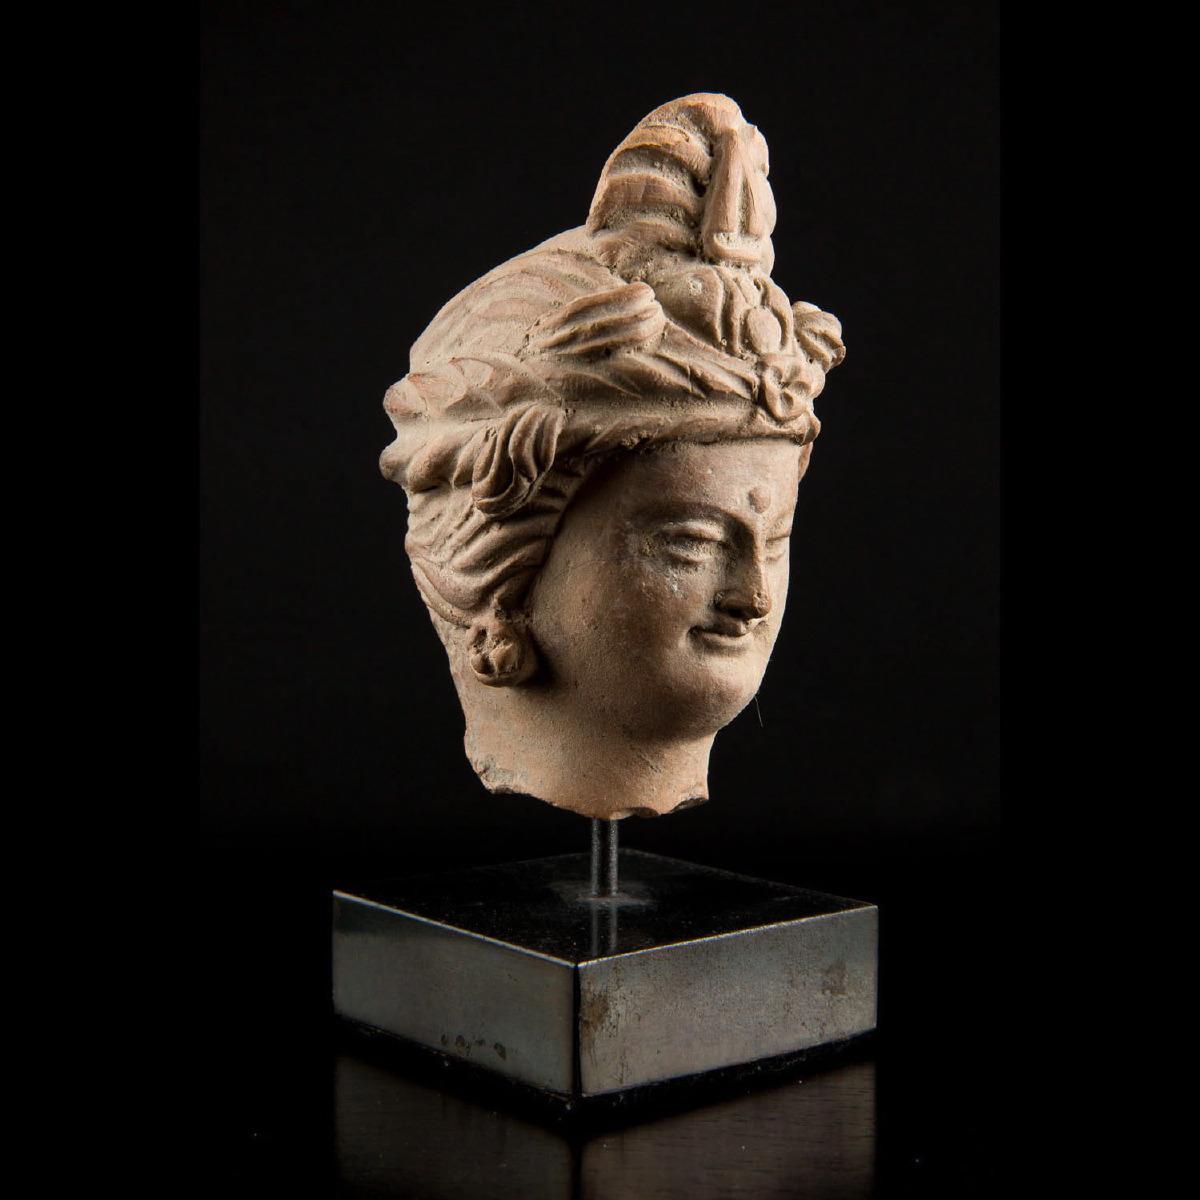 Photo of bodhisattva-head-with-turban-gandhara-afganistan-galerie-golconda